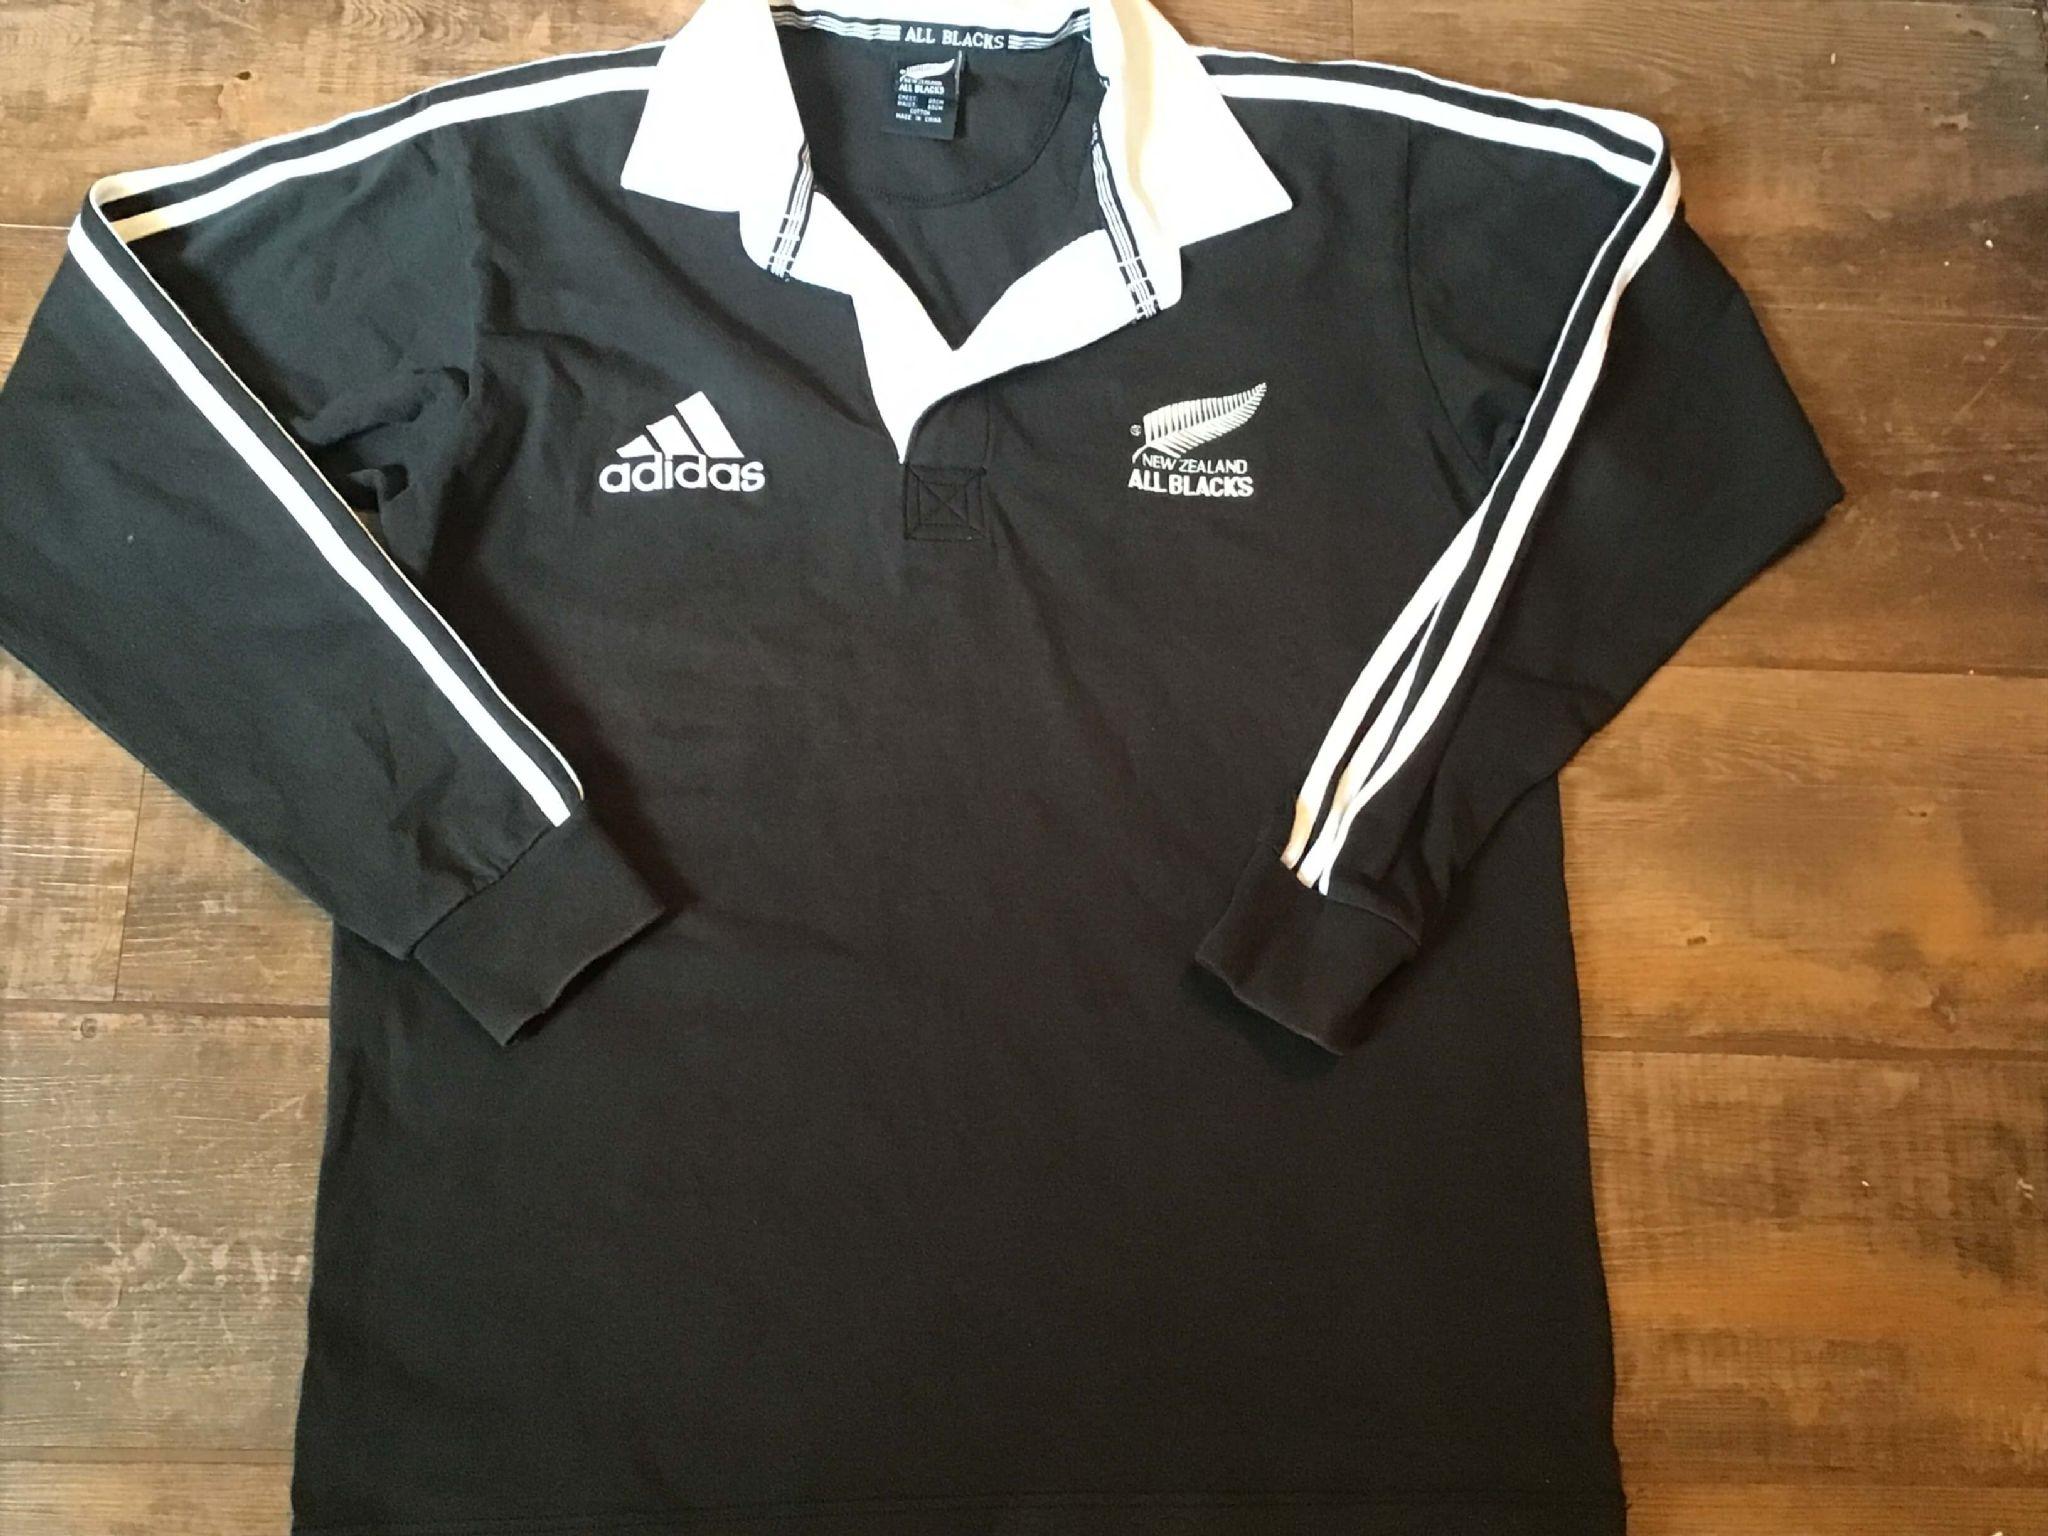 1999 2000 New Zealand Ls Rugby Union Shirt Adults Medium All Blacks